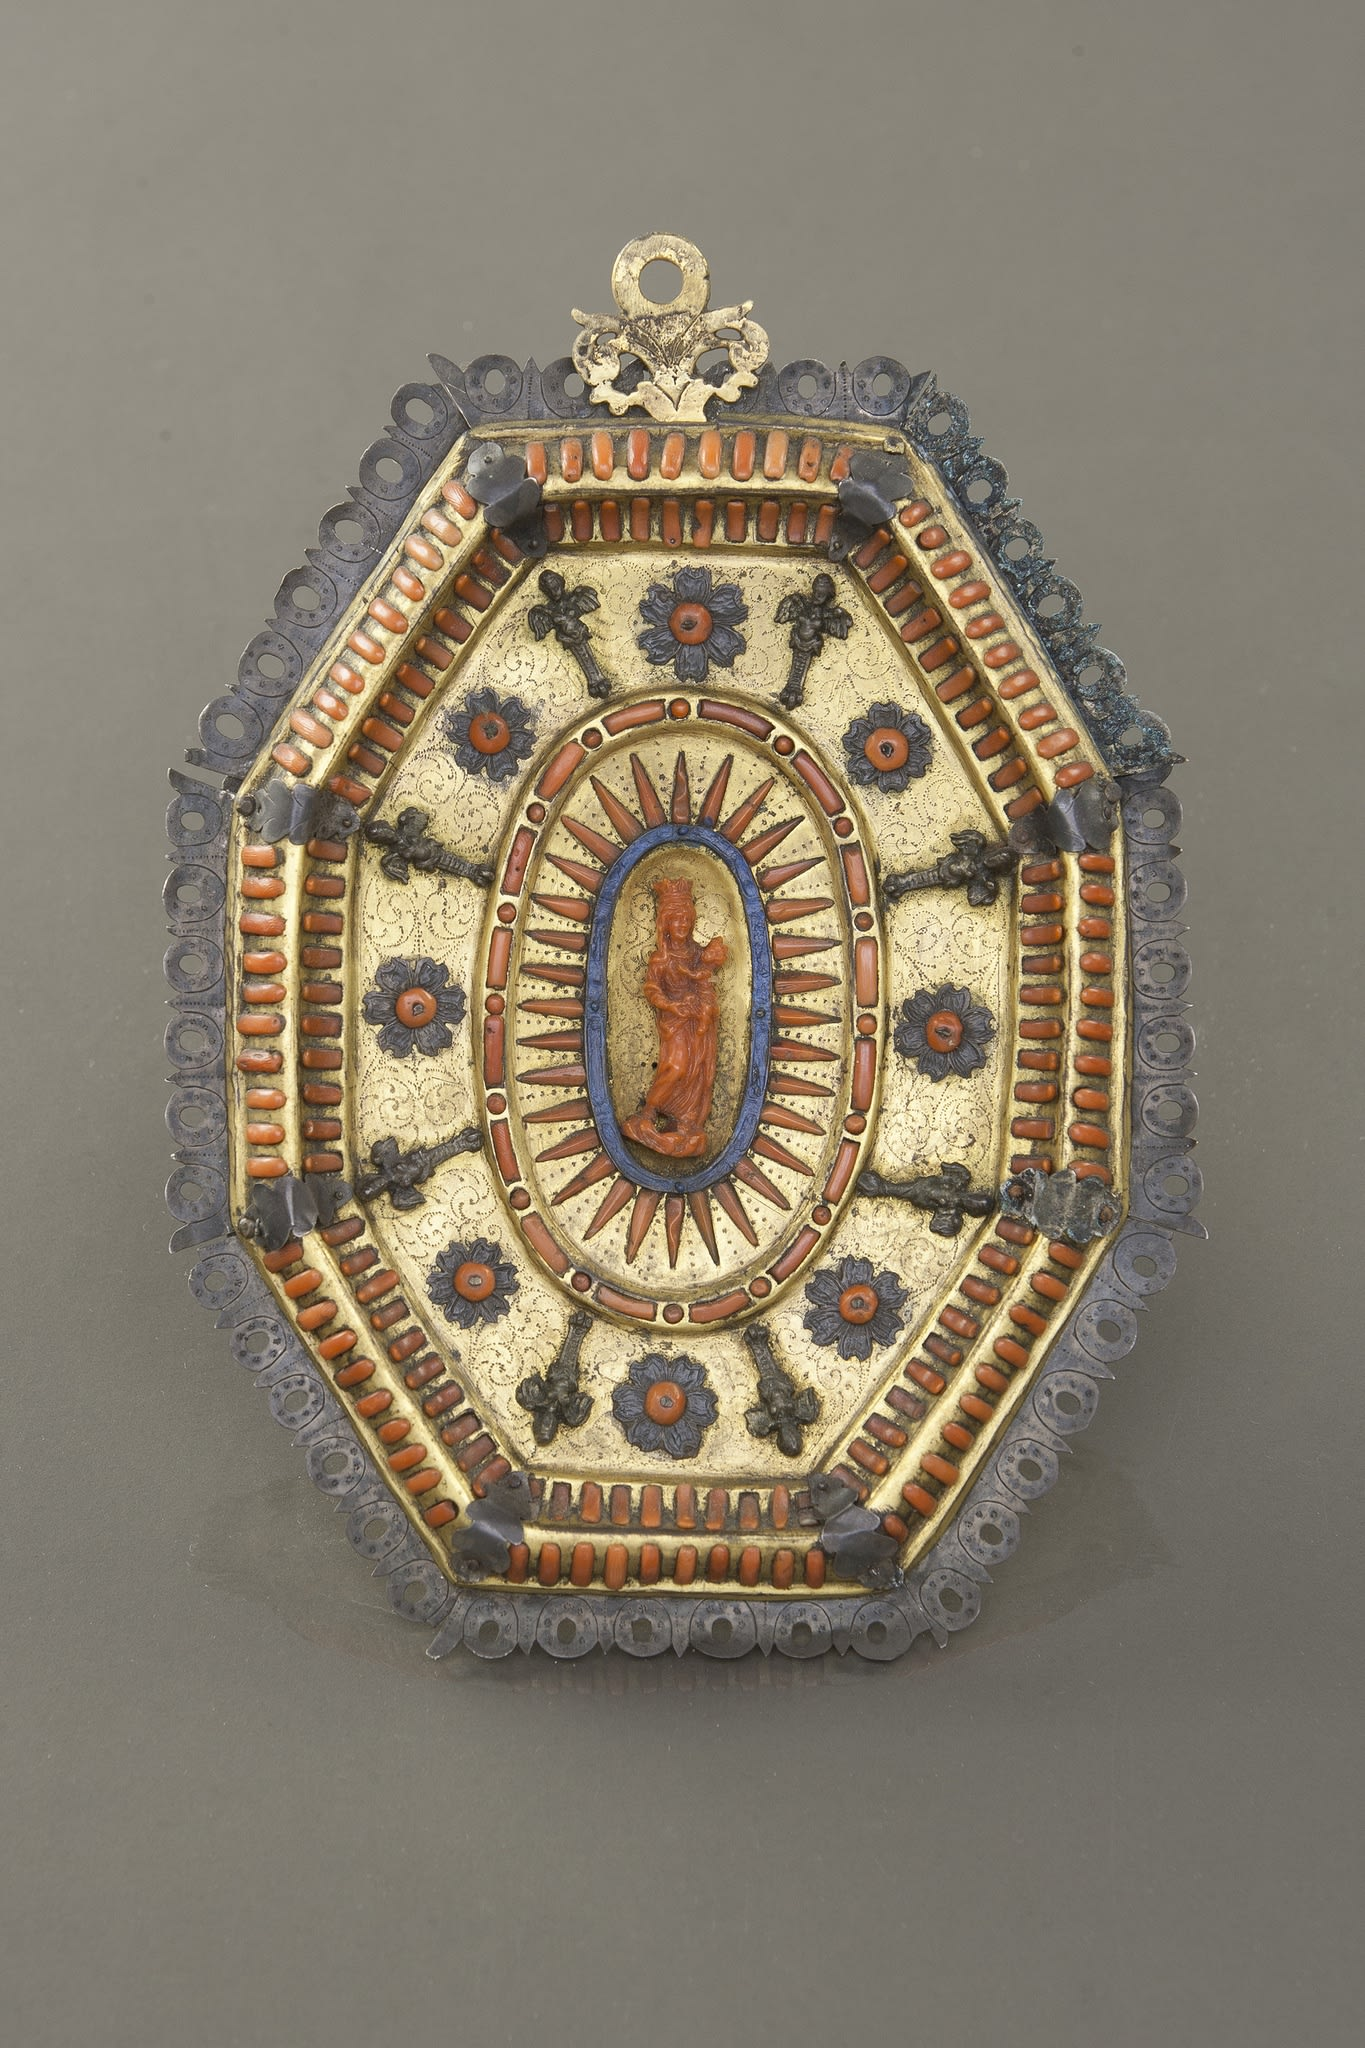 https://artlogic-res.cloudinary.com/w_2400,h_2400,c_limit,f_auto,fl_lossy,q_auto/artlogicstorage/brunfineart/images/view/18817416e3d834b48e5081330573cdad4927b2a4/brunfineart-trapani-pair-of-plaques-17th-century.jpg